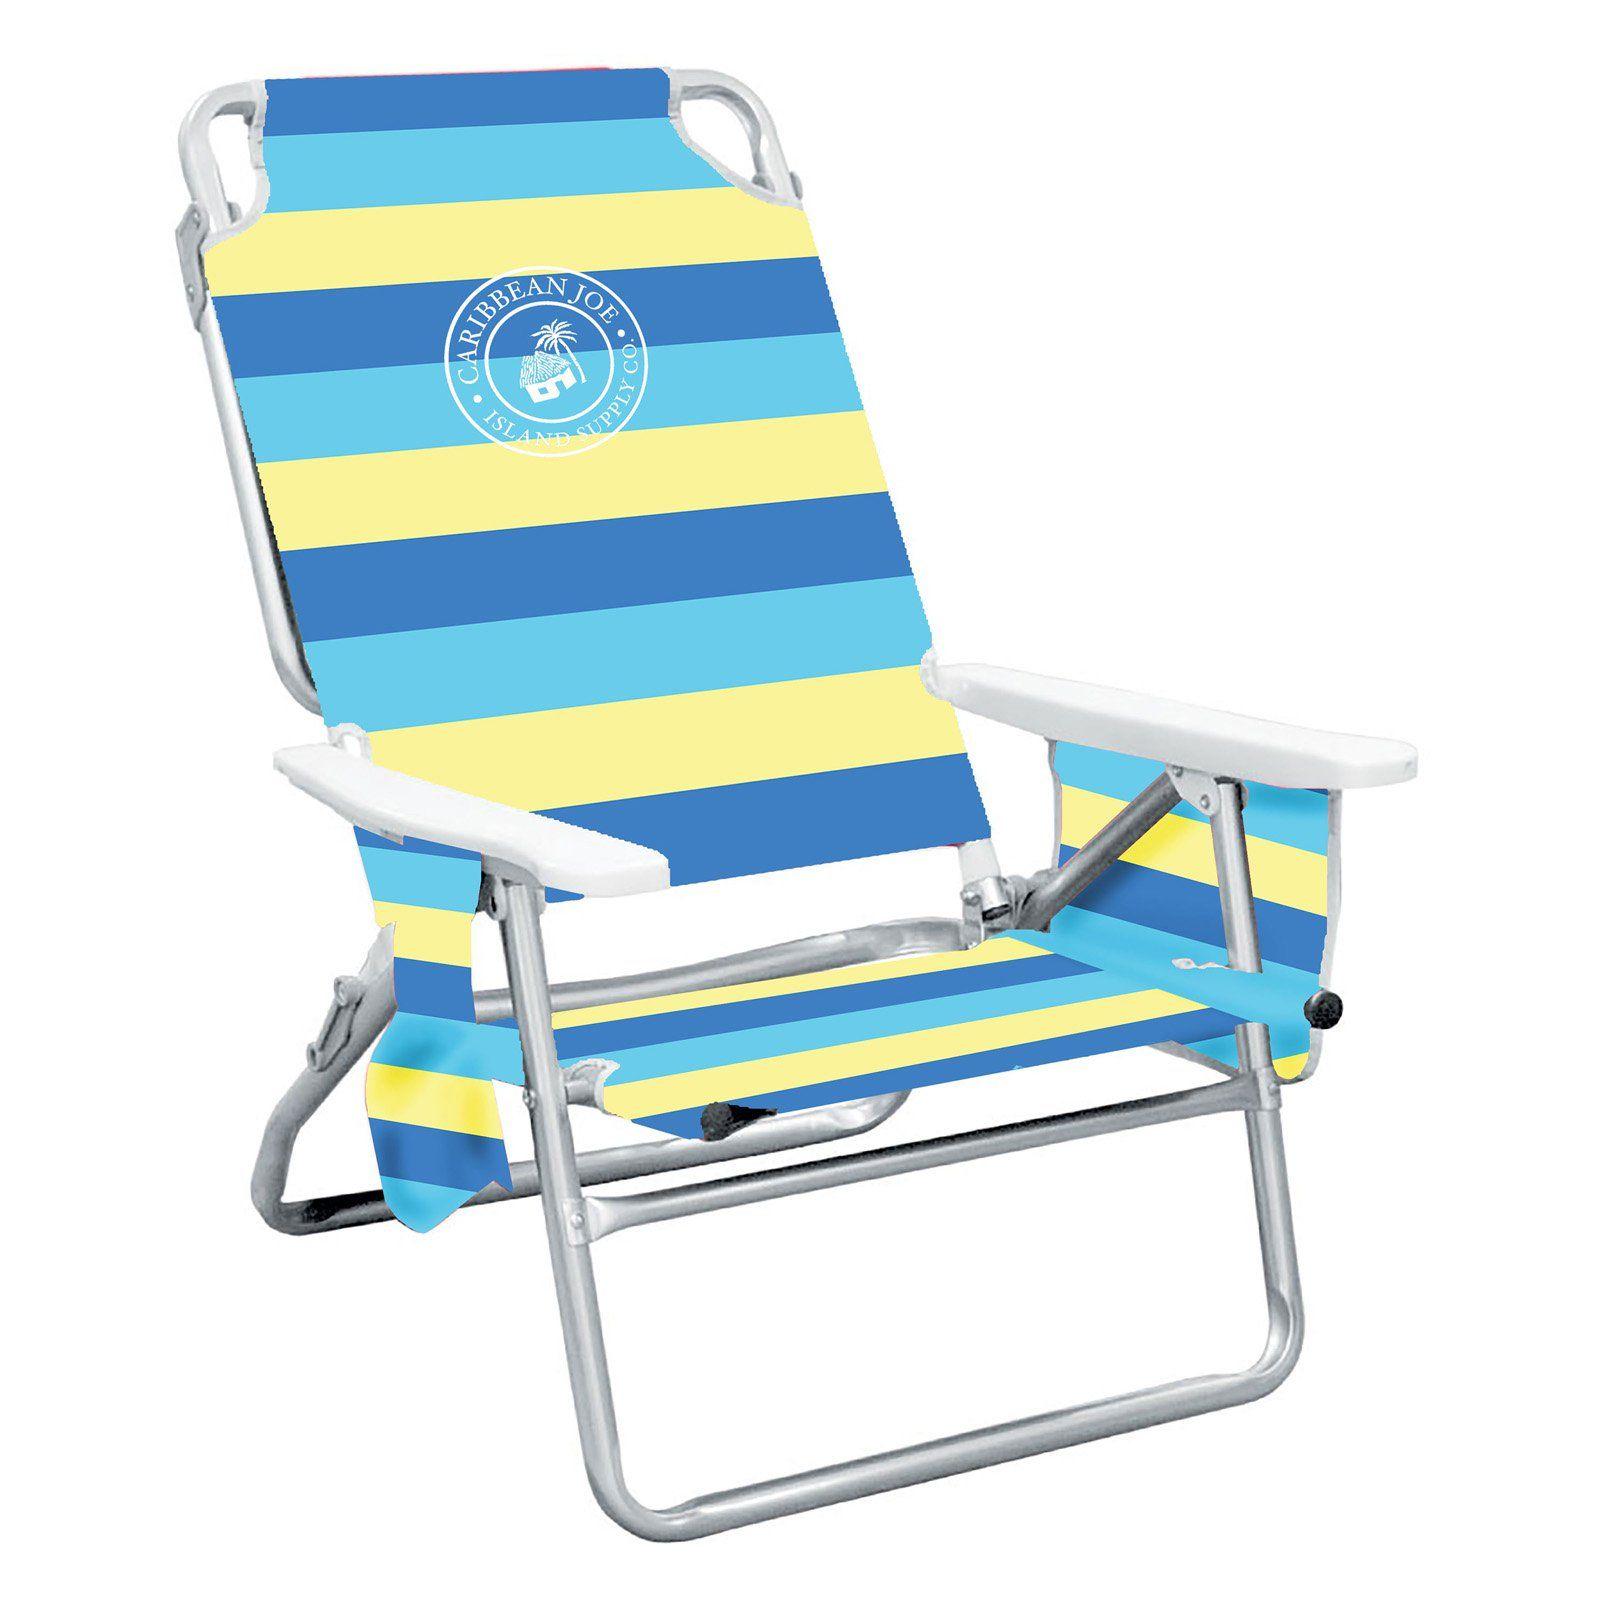 Outdoor Caribbean Joe 5 Position Striped Folding Low Beach Chair